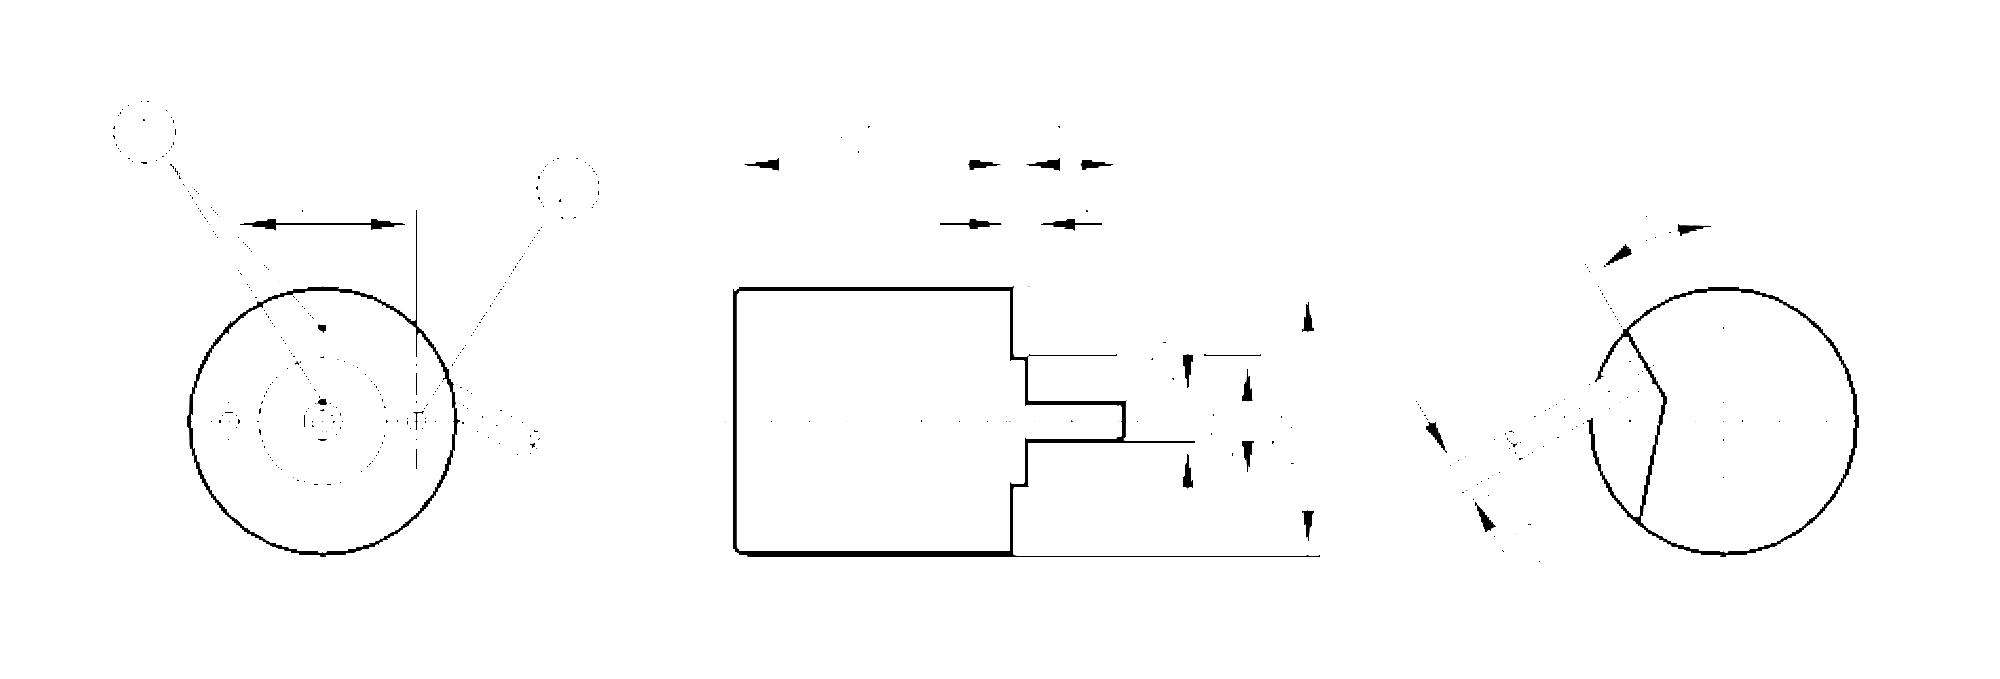 Schema Collegamento Encoder Incrementale : Rb encoder incrementale con albero pieno ifm